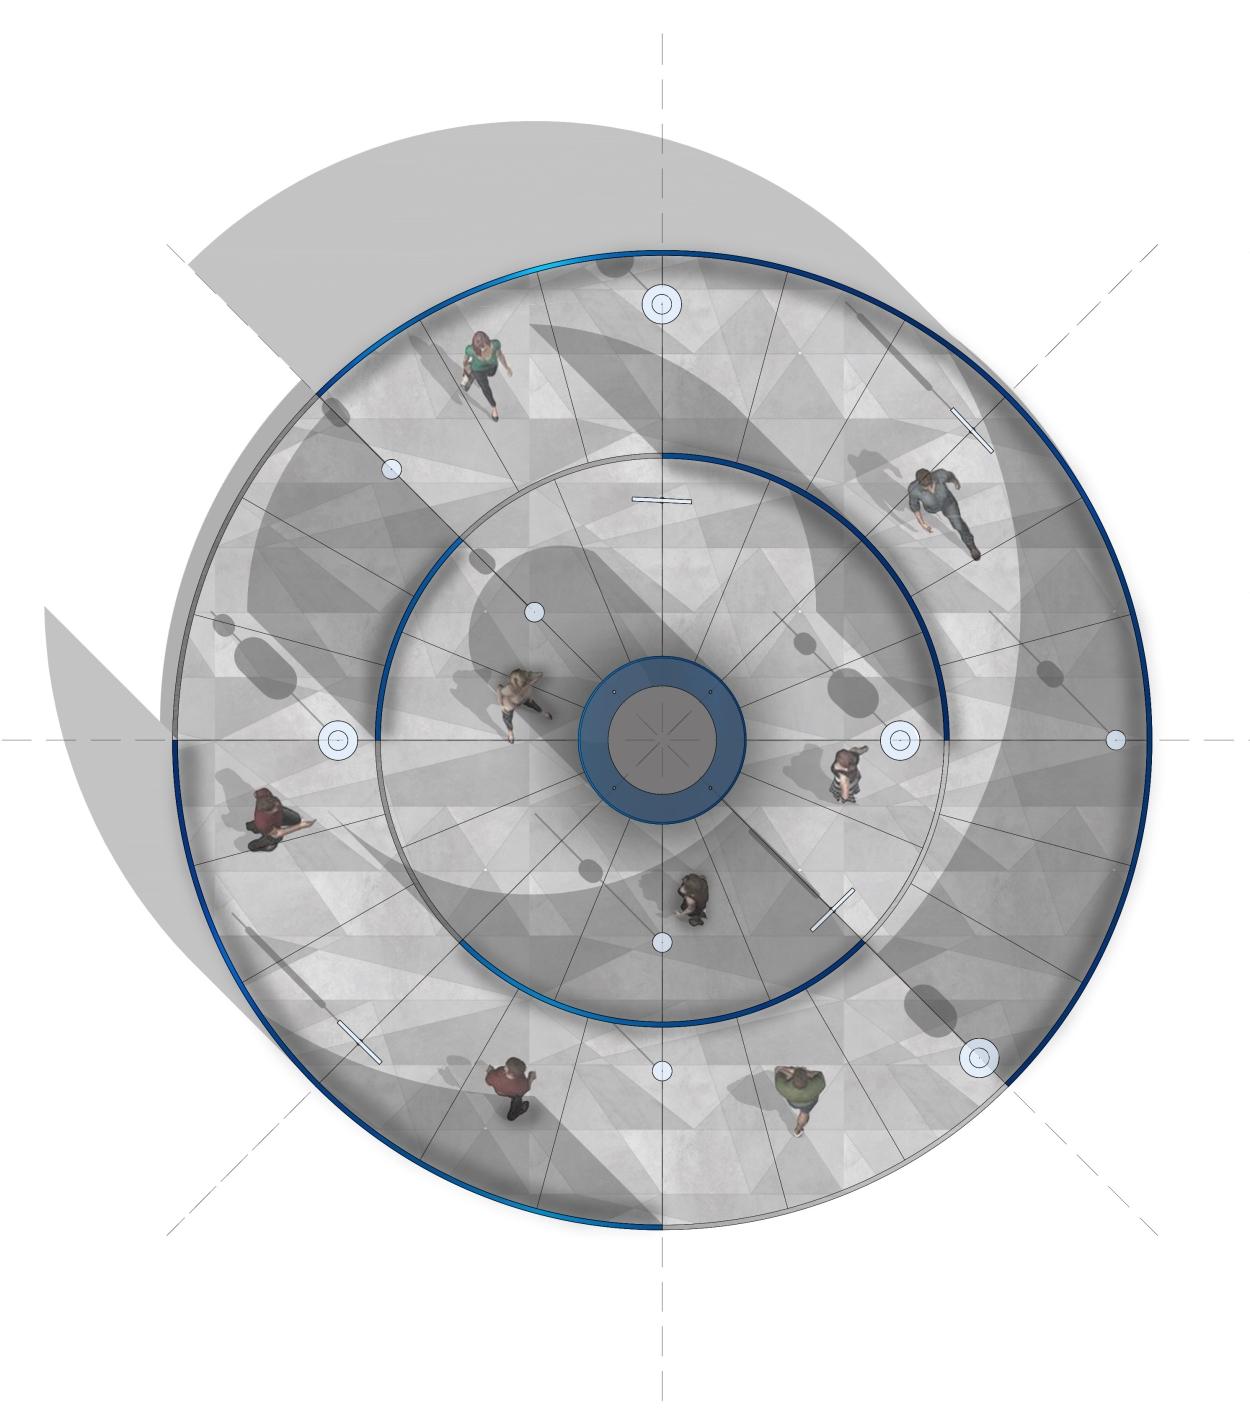 /Users/chiaracastagnola/Documents/MARANGONI/RADO CONTEST/RadoCon